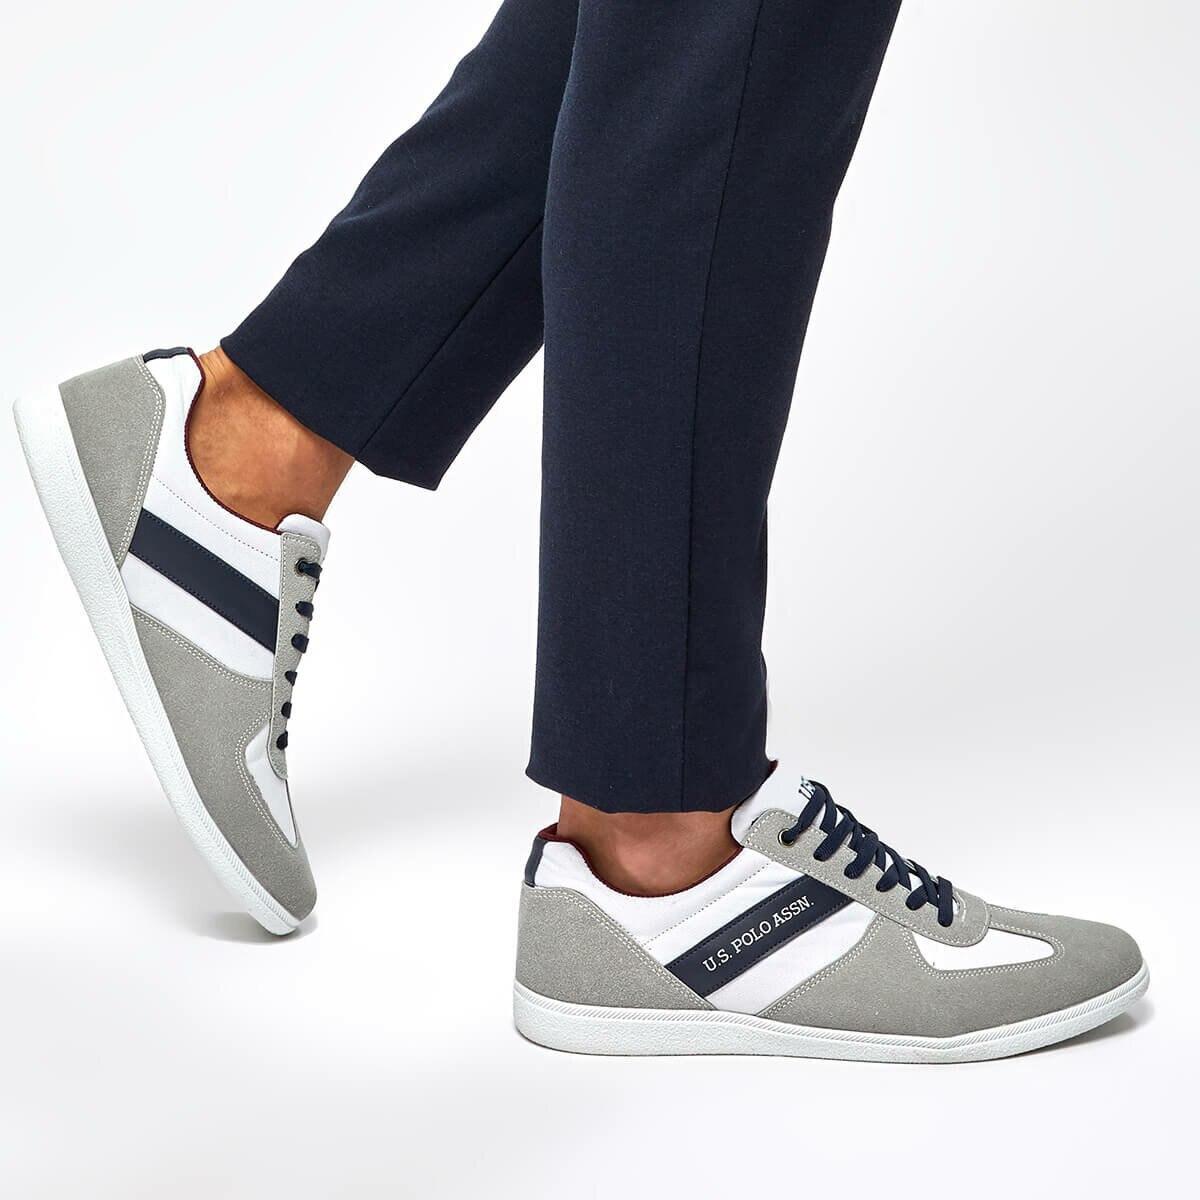 FLO VARIAL White Men 'S Sneaker Shoes U.S. POLO ASSN.